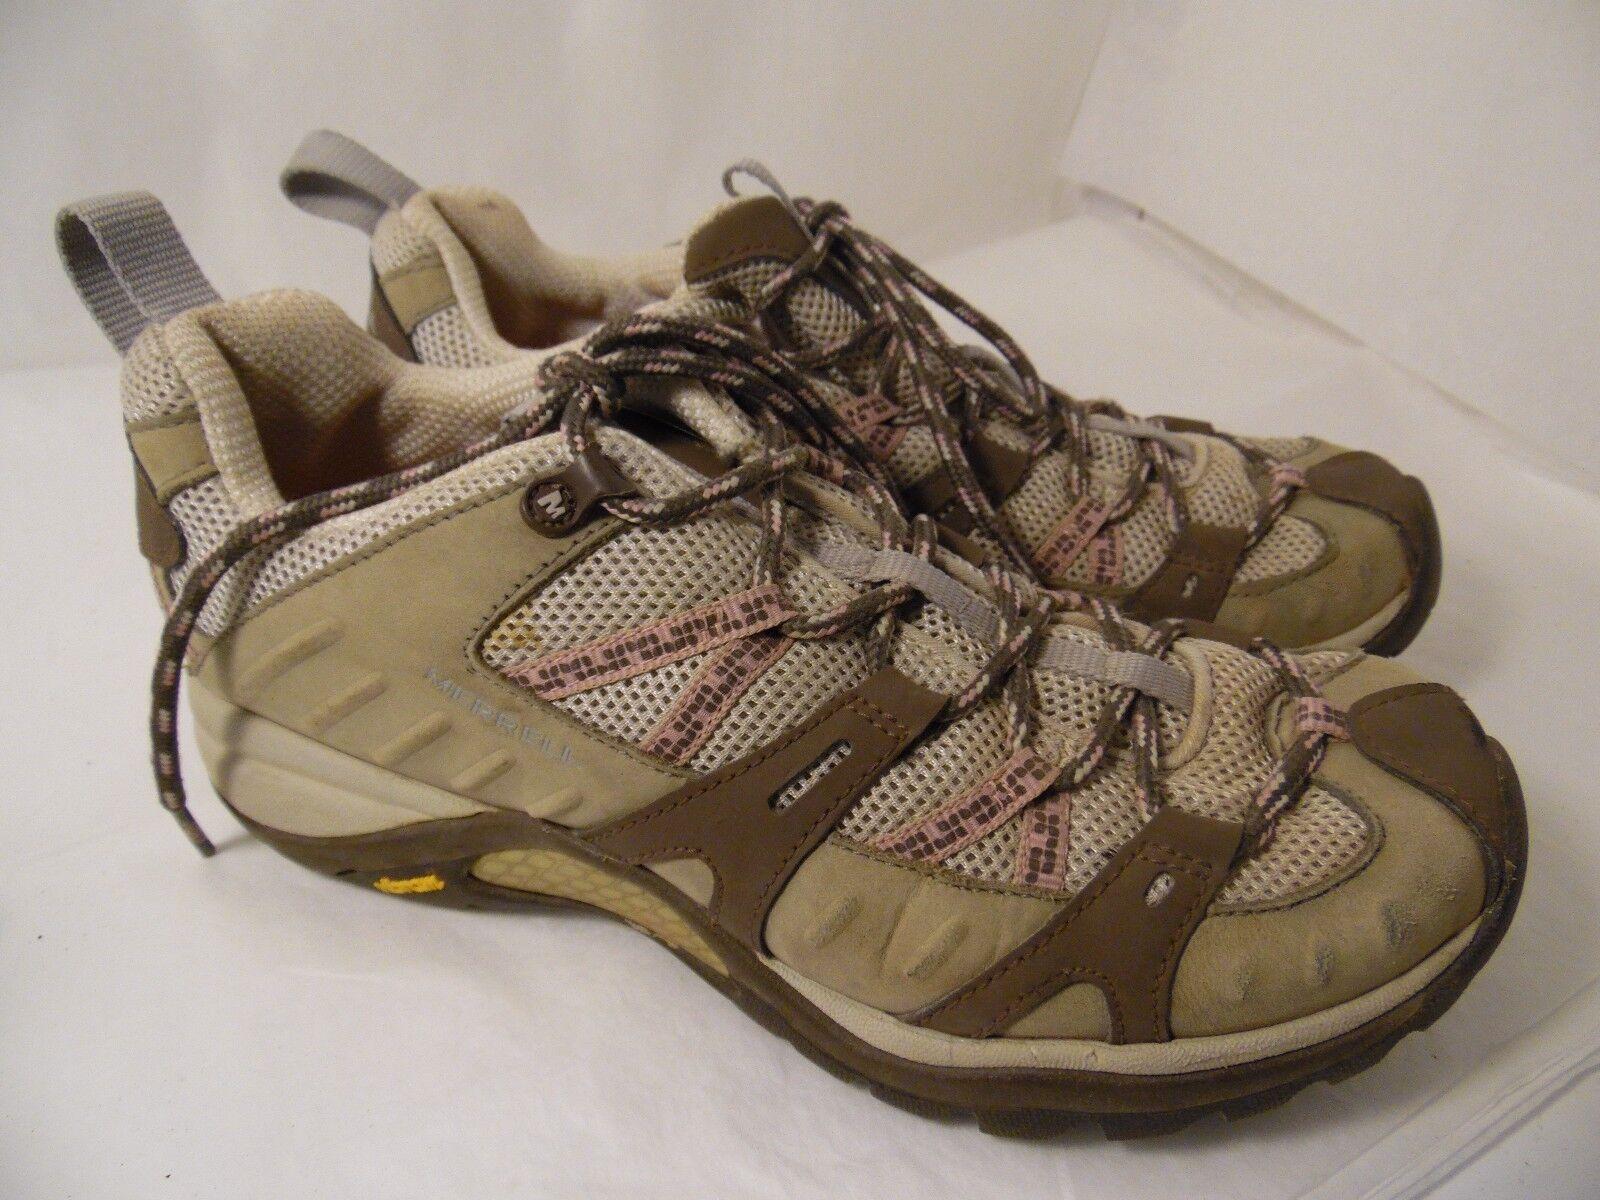 Merrell Siren Sport Elephant Pink  J13888 Sport Sneakers shoes Hiking Womens 8